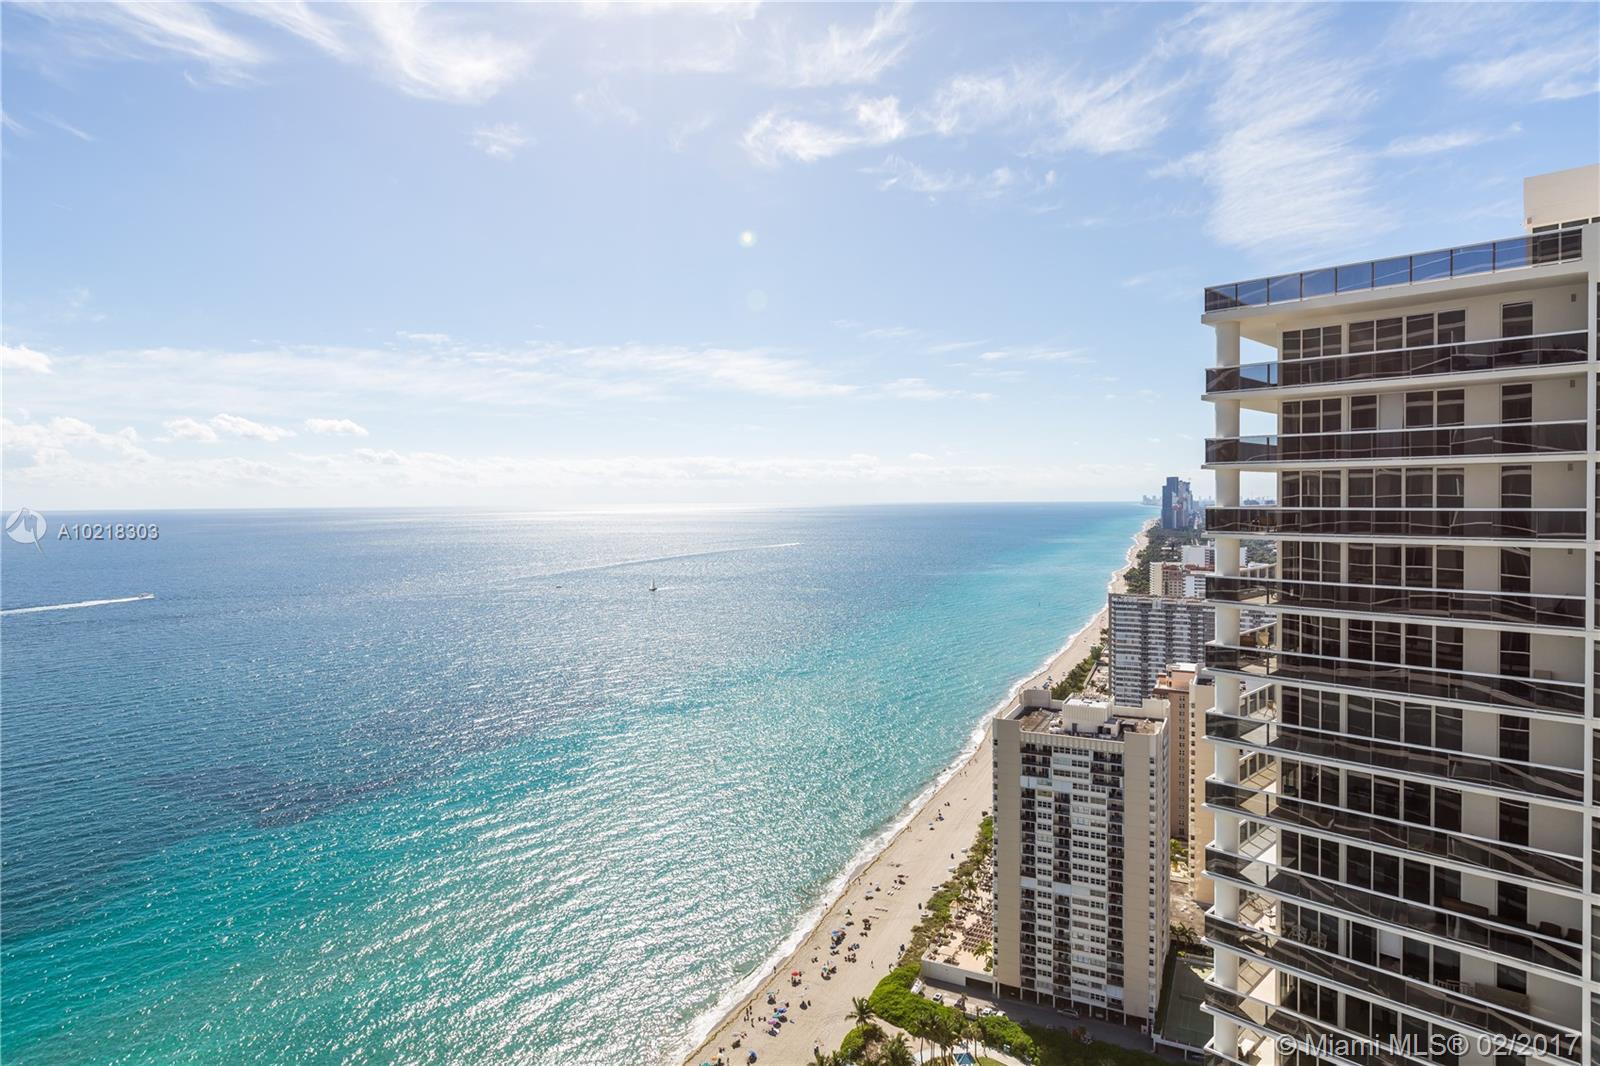 Beach Club Towers #4205 - 01 - photo